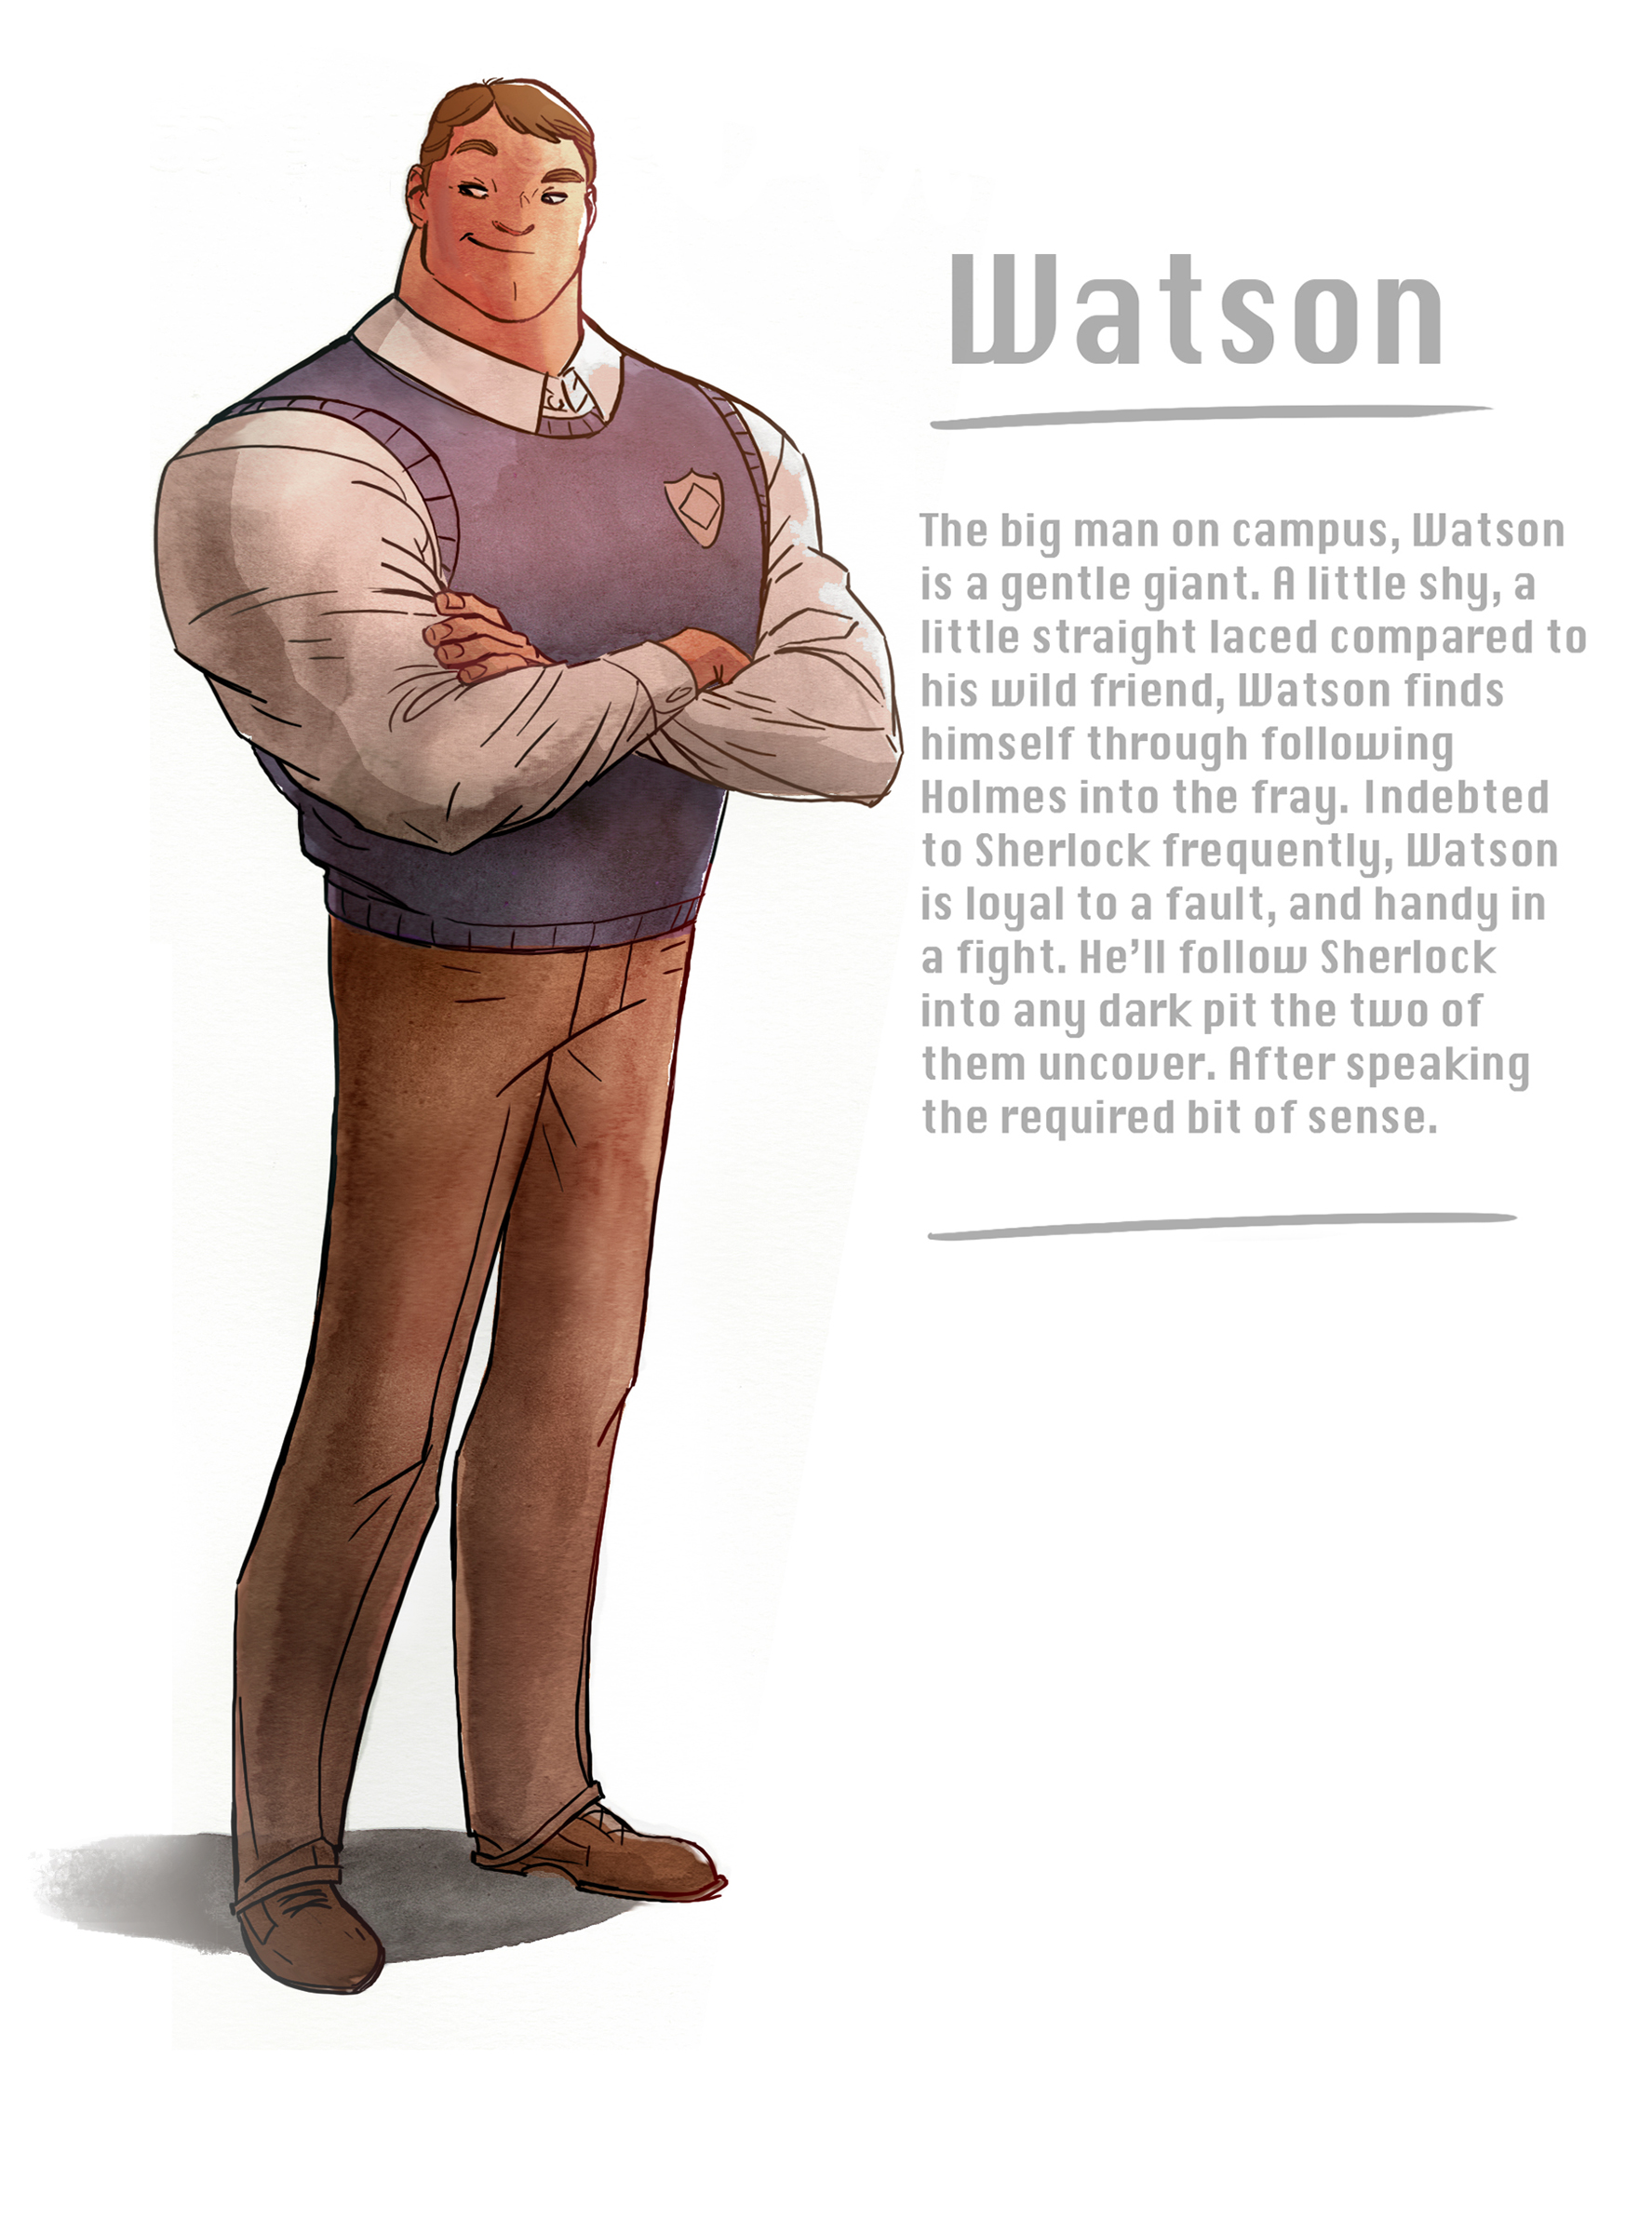 Watson1.jpg